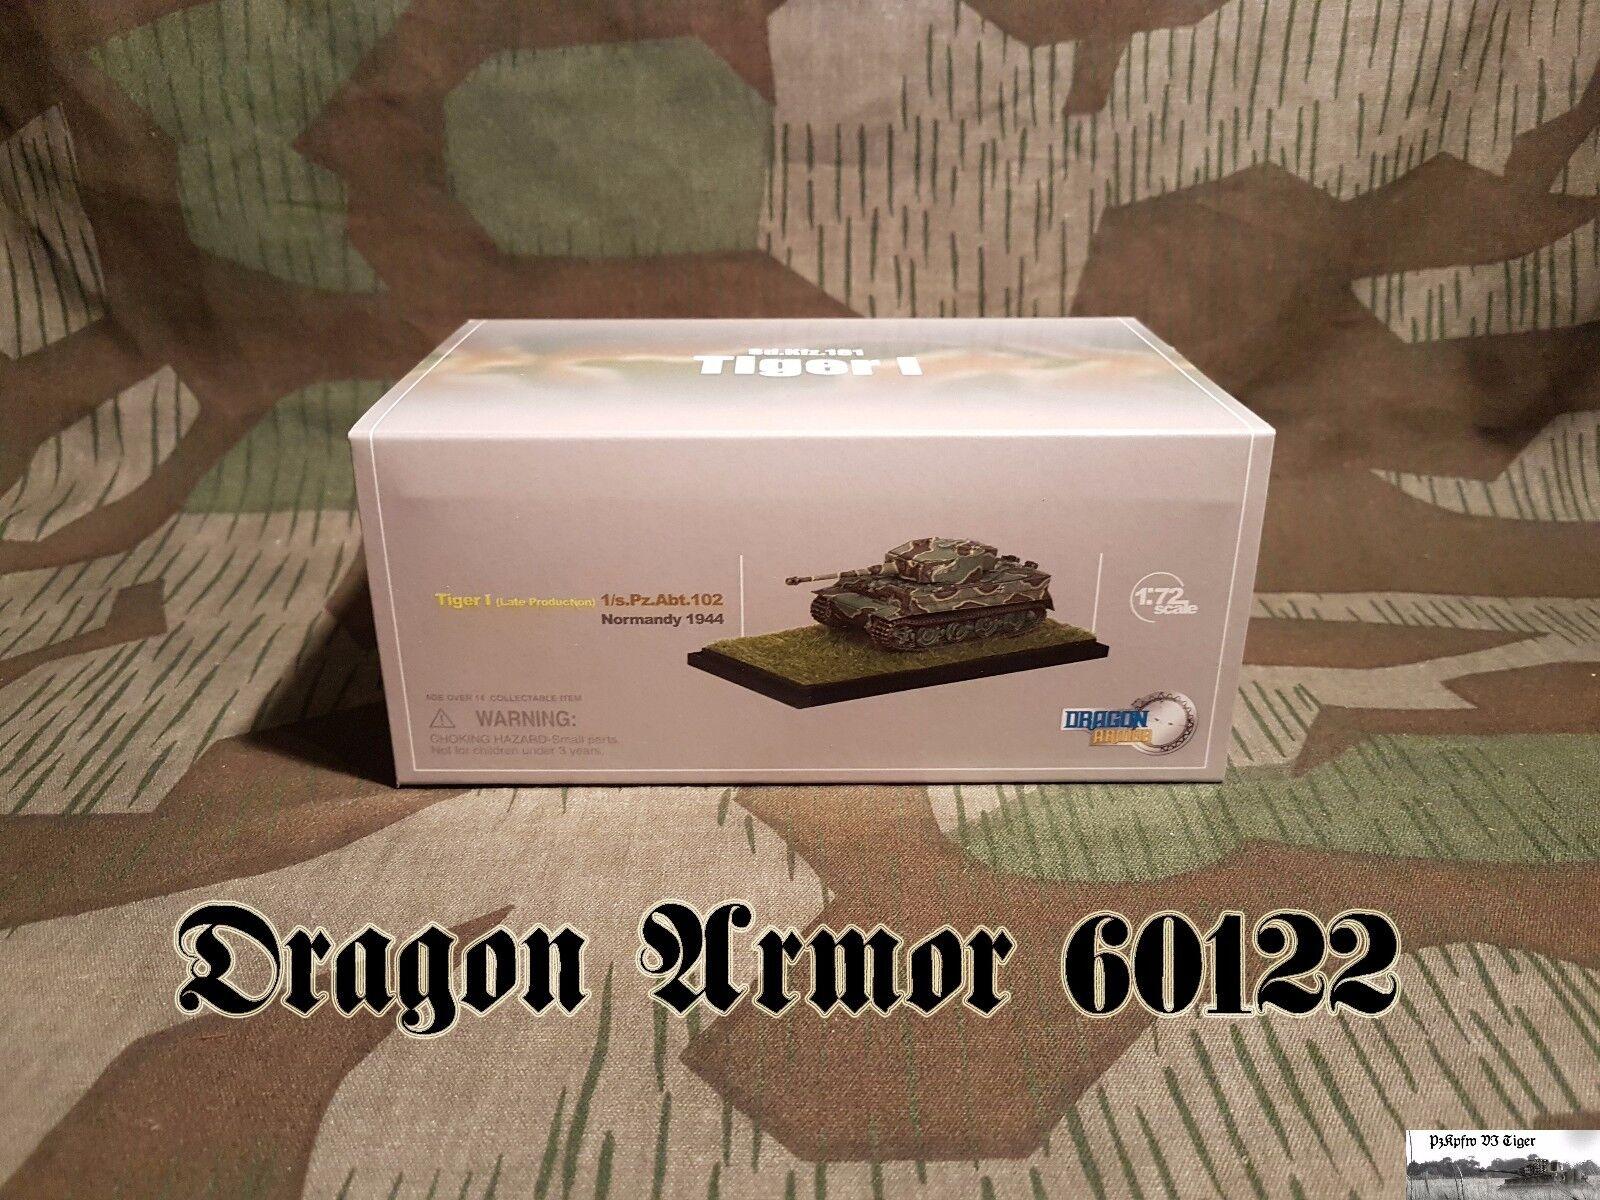 tienda en linea  122 Dragon Armor 60122 Tiger I late late late production w Zimmerit, 1. s.pz.abt.102 1 72  tienda en linea